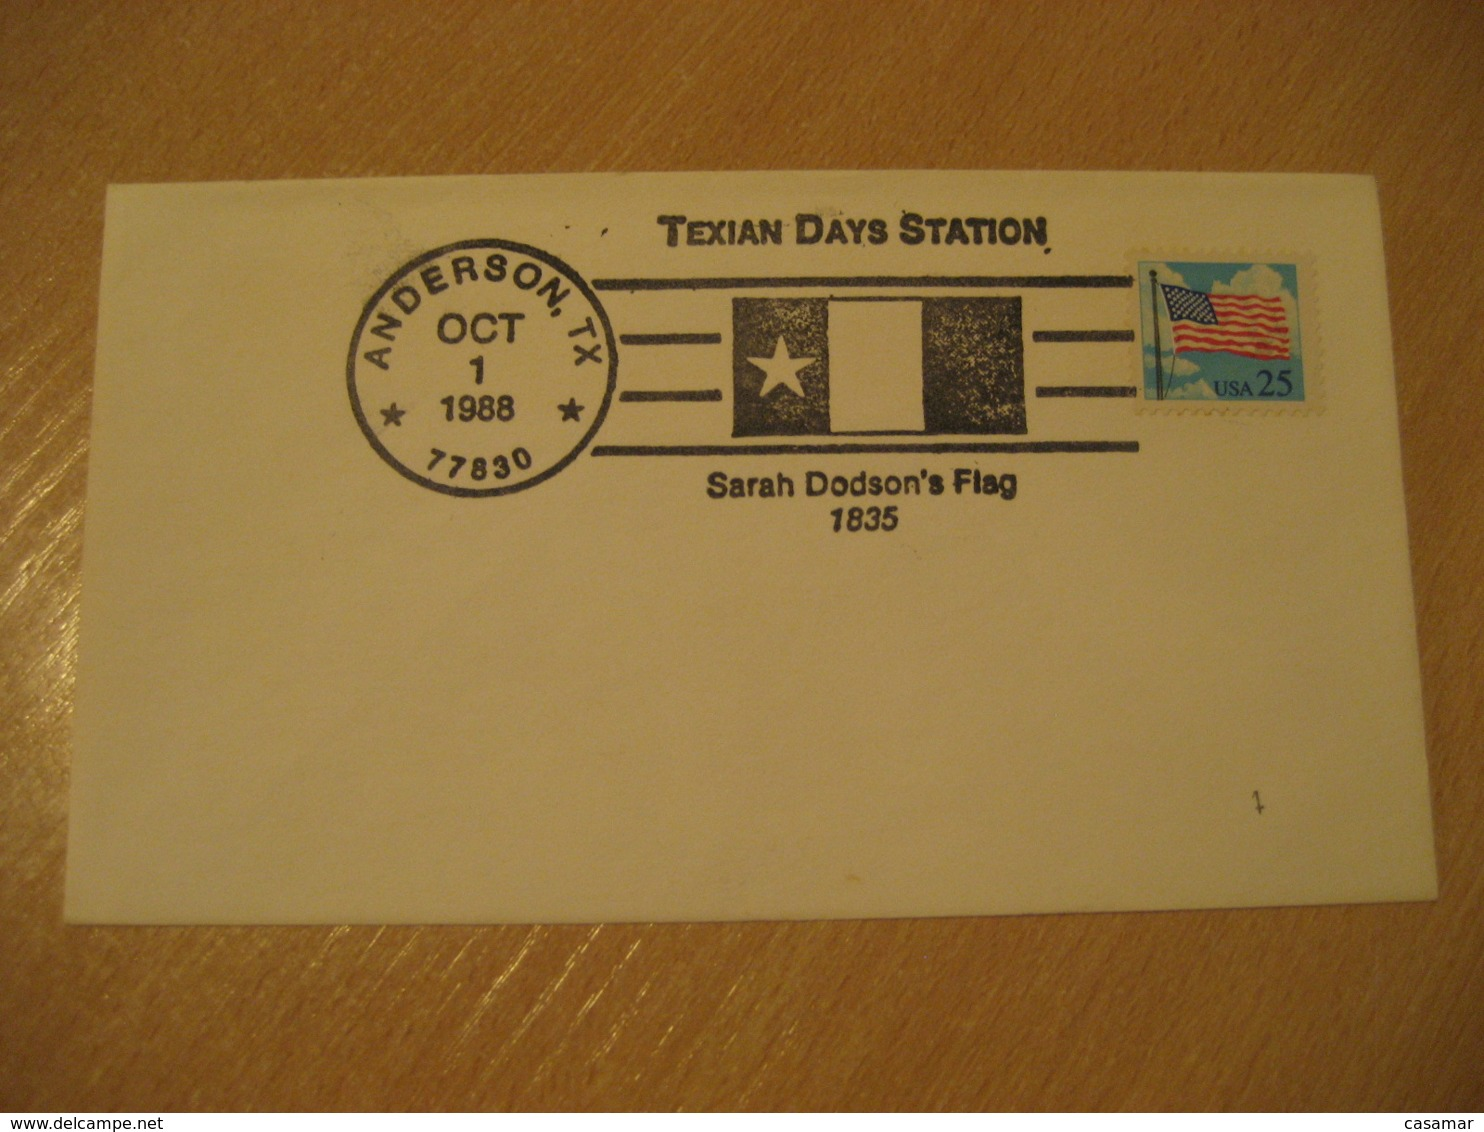 ANDERSON 1988 Sarah Dodson Flag Flags Cancel Cover USA - Buste